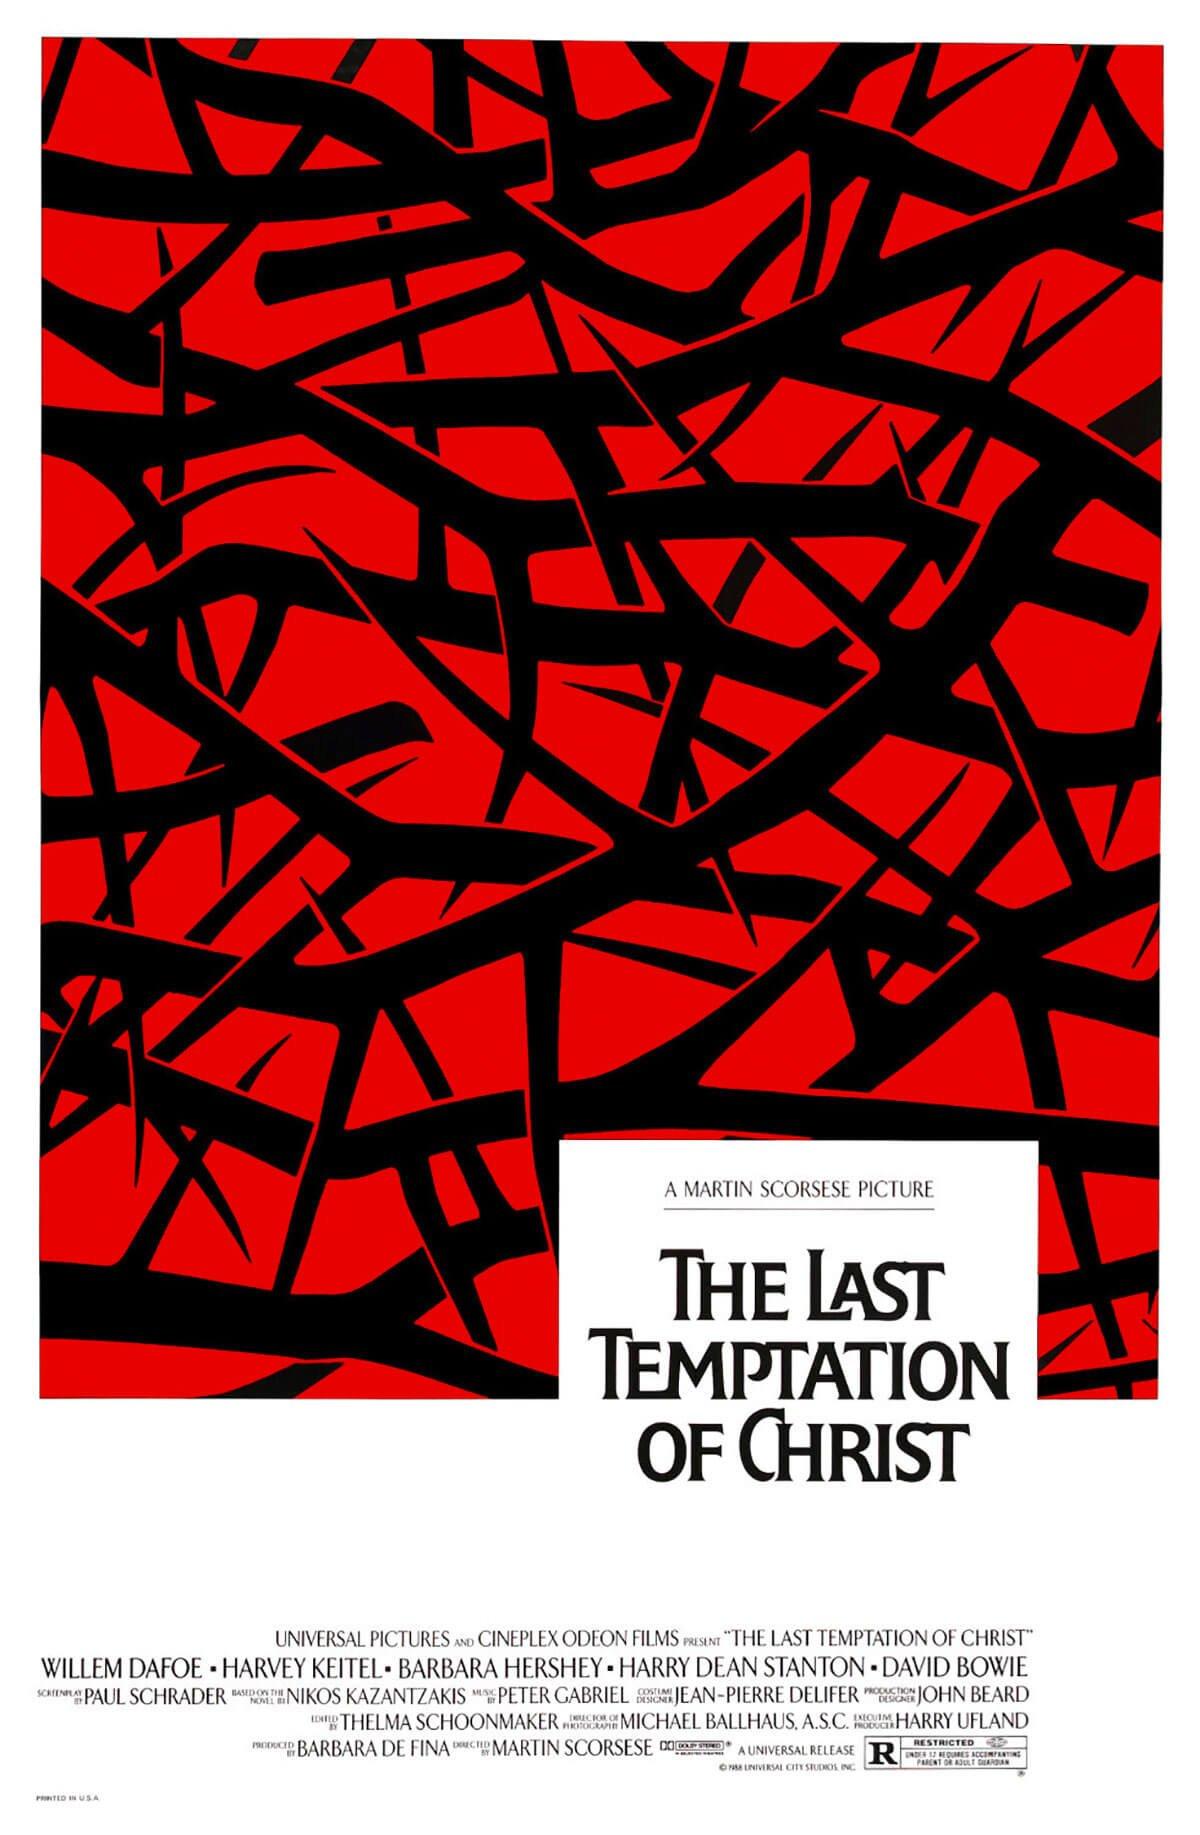 The Last Temptation of Christ, 1988